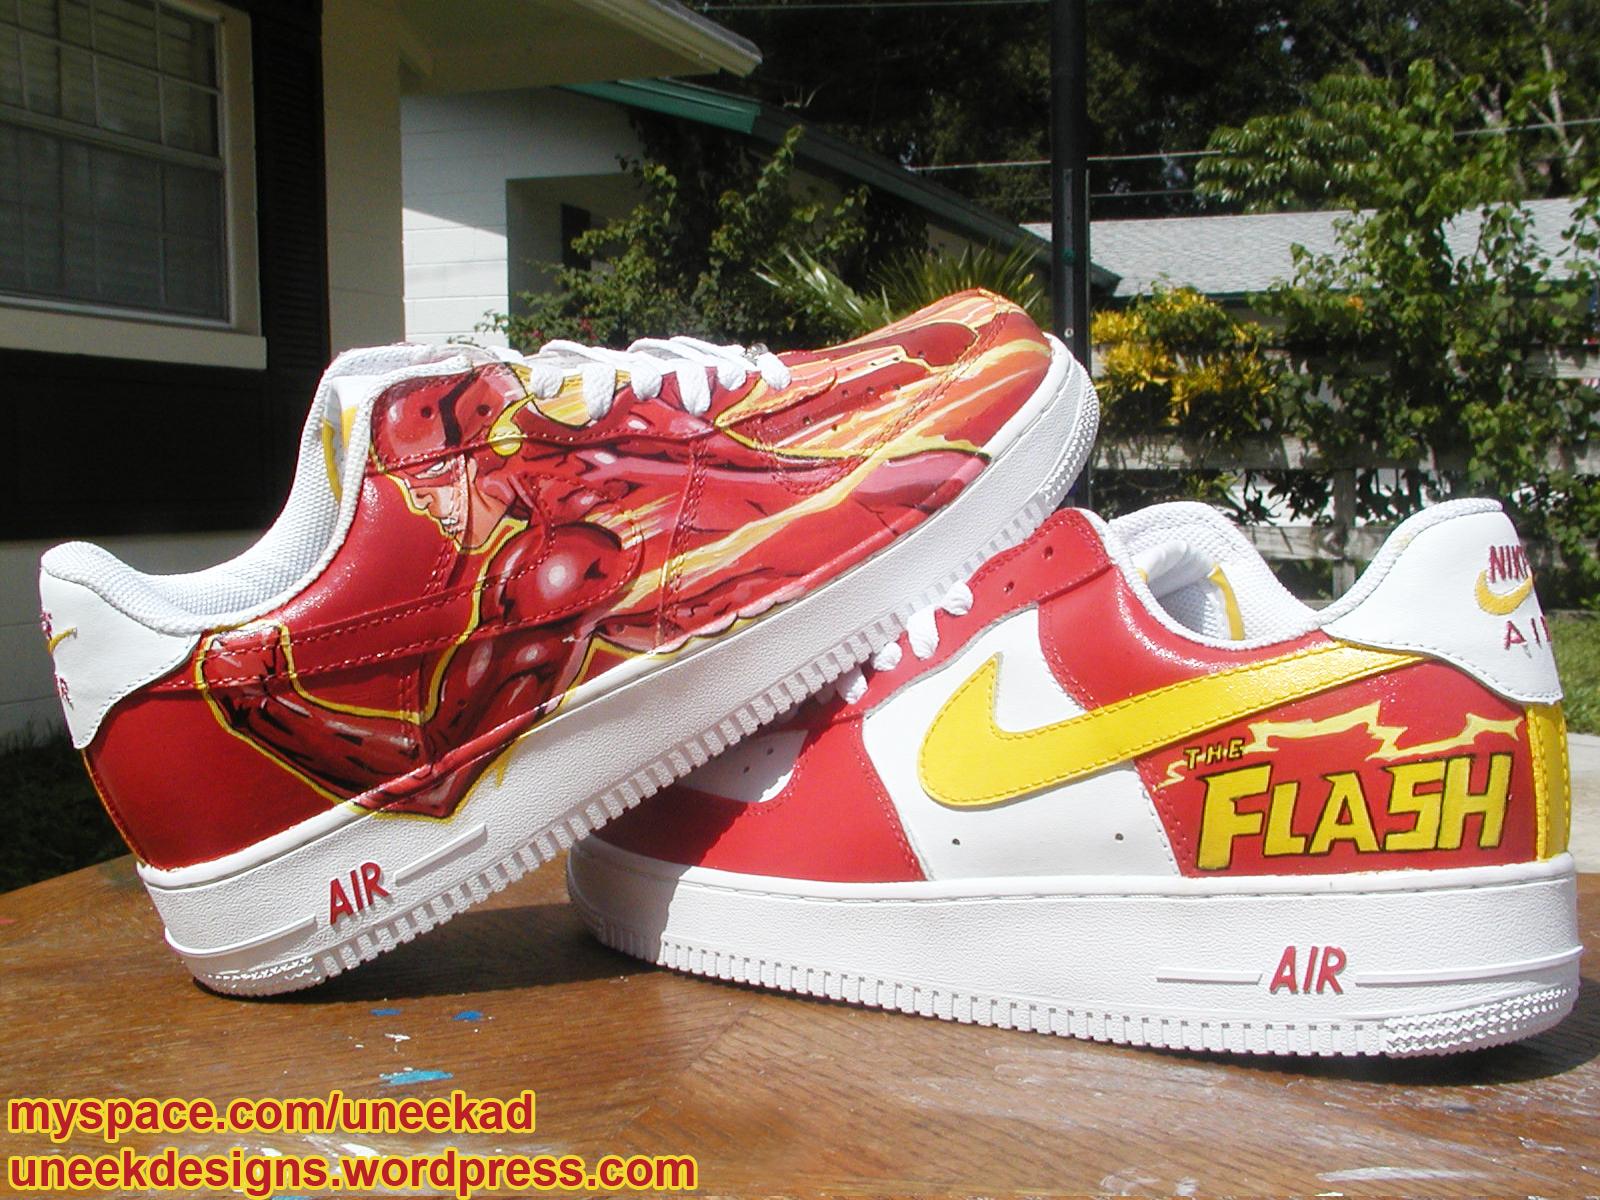 nike air force 1 flash